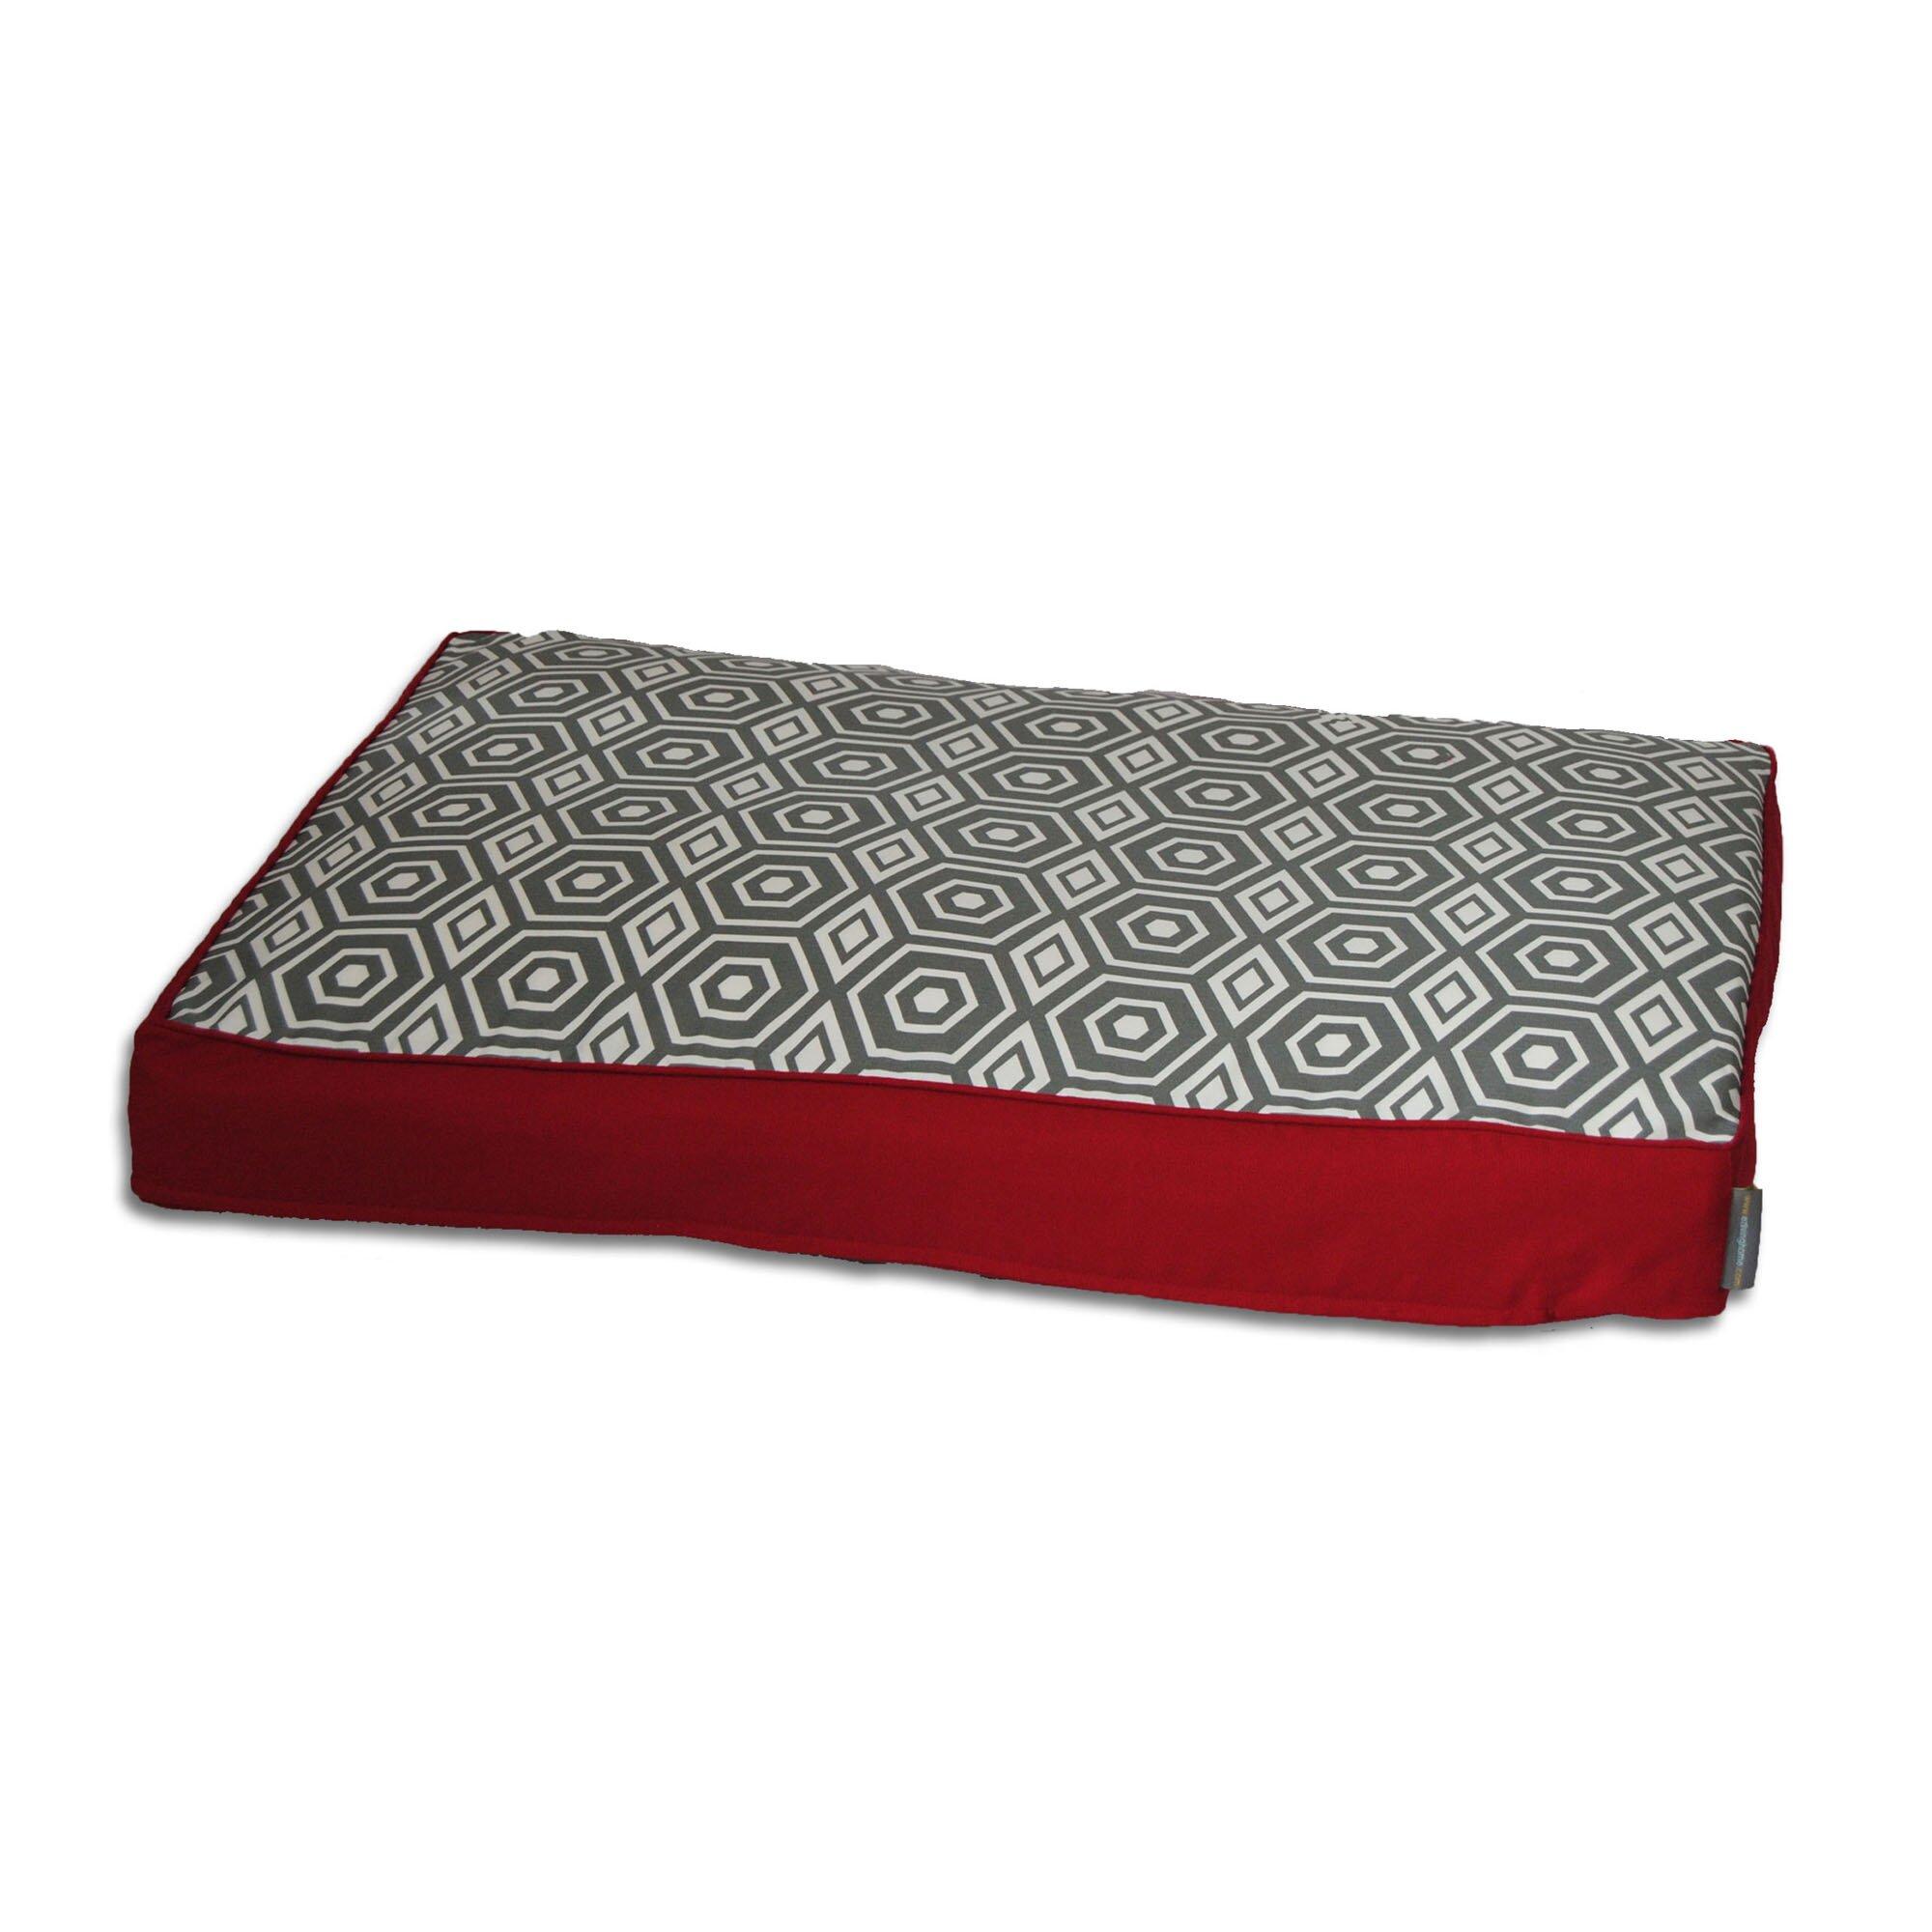 EZ Living Home Honeycomb Memory Foam Topper Pet Pillow Bed Wayfair